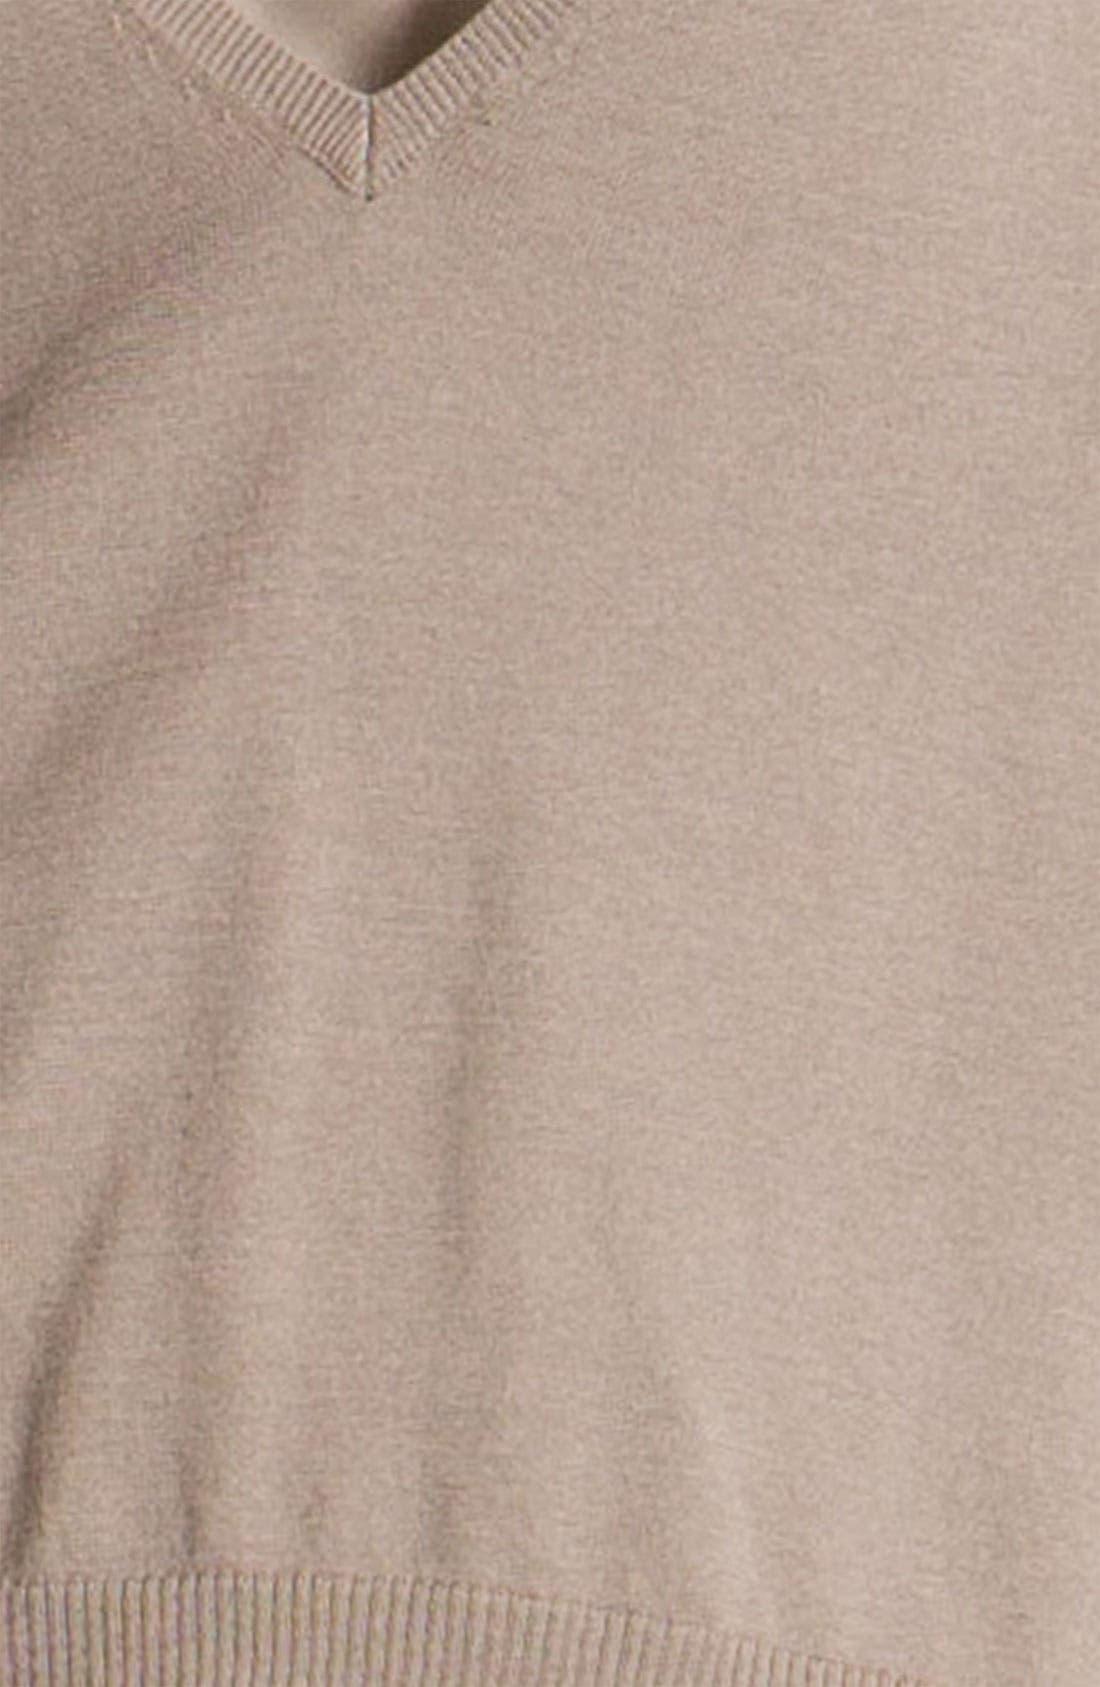 Alternate Image 3  - Weekend Max Mara 'Opale' Sweater & Camisole